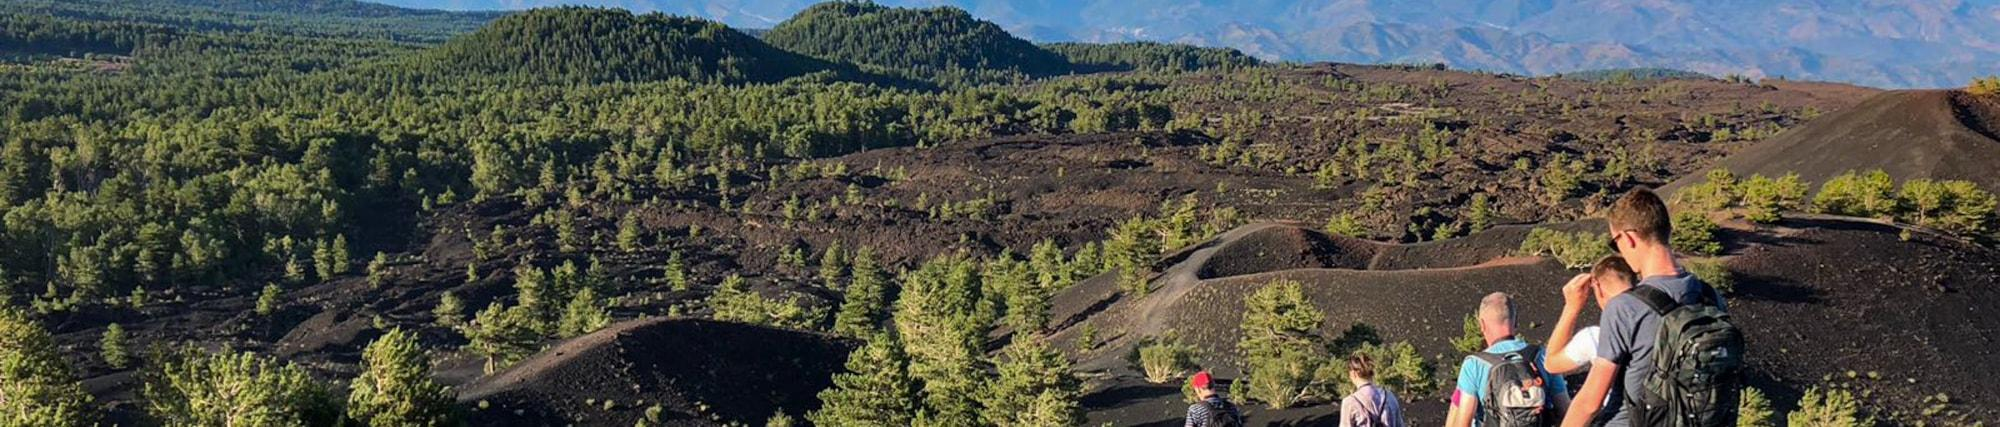 Trekking tra i crateri del Monte Etna